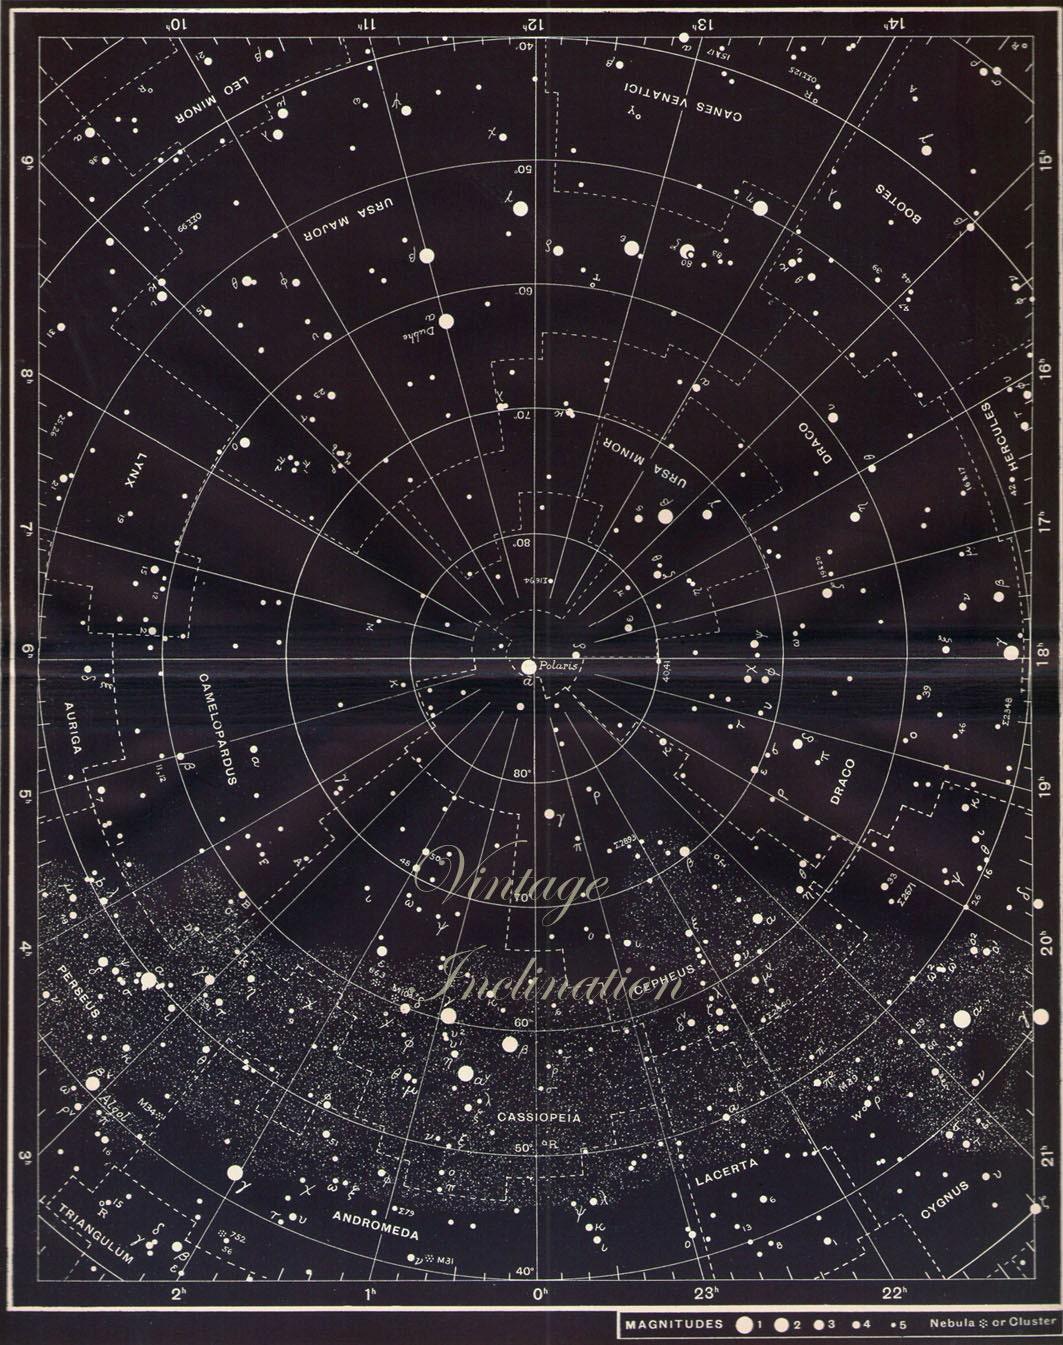 printable blank star chart images